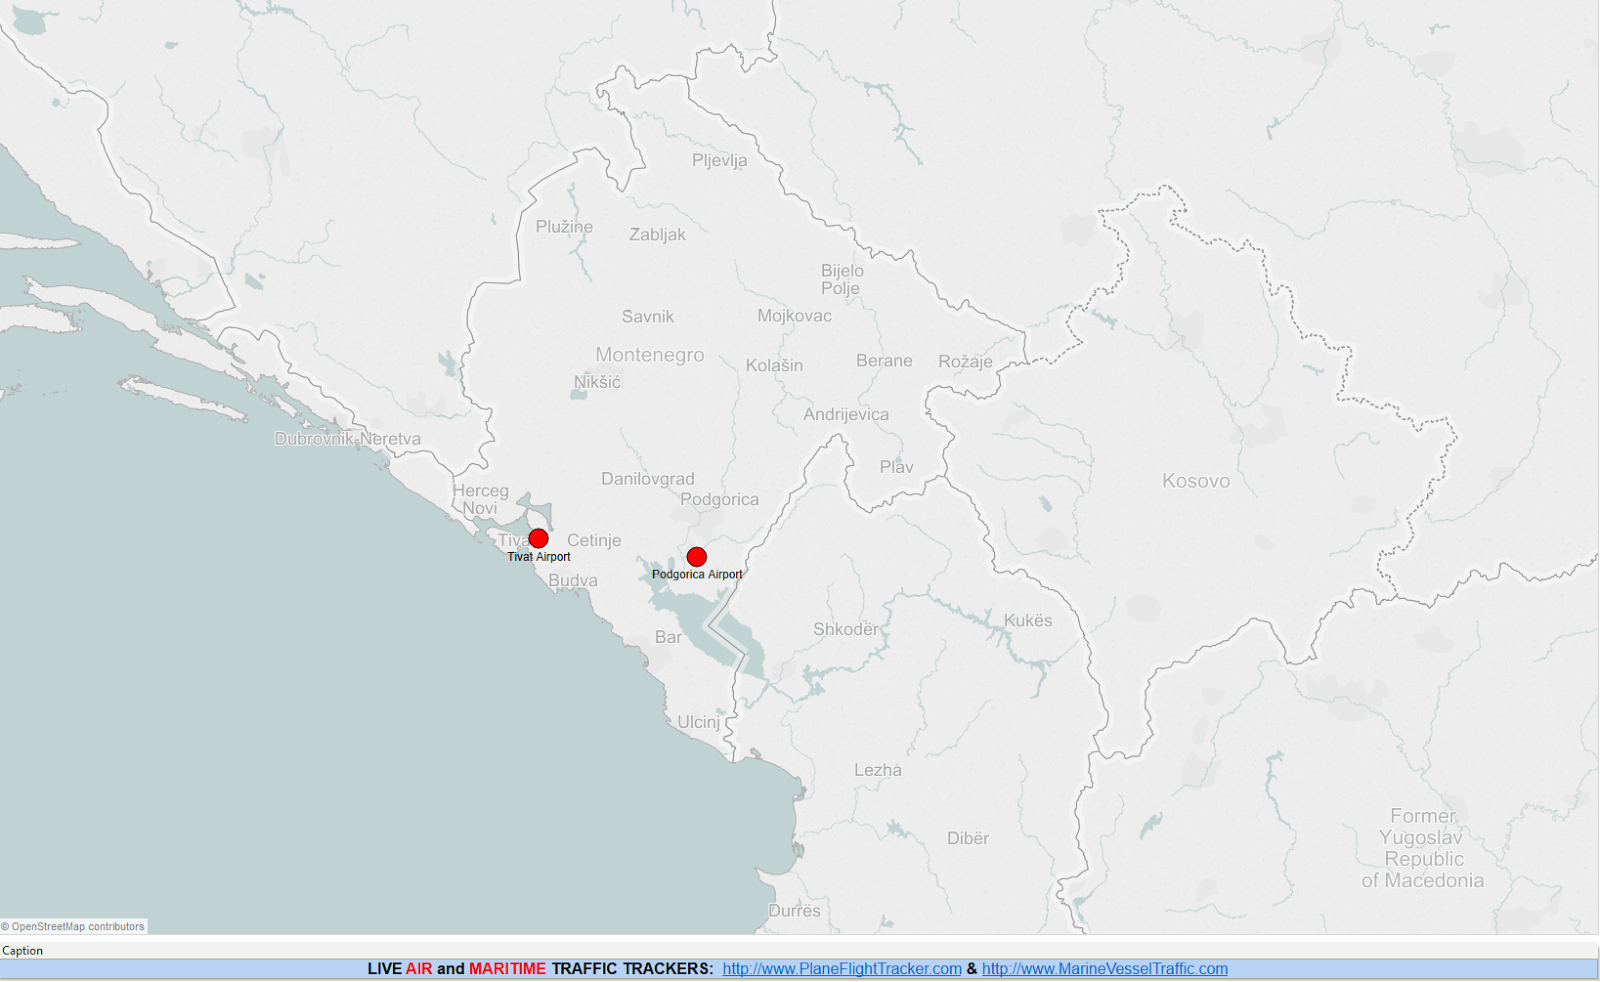 MONTENEGRO AIRPORTS MAP